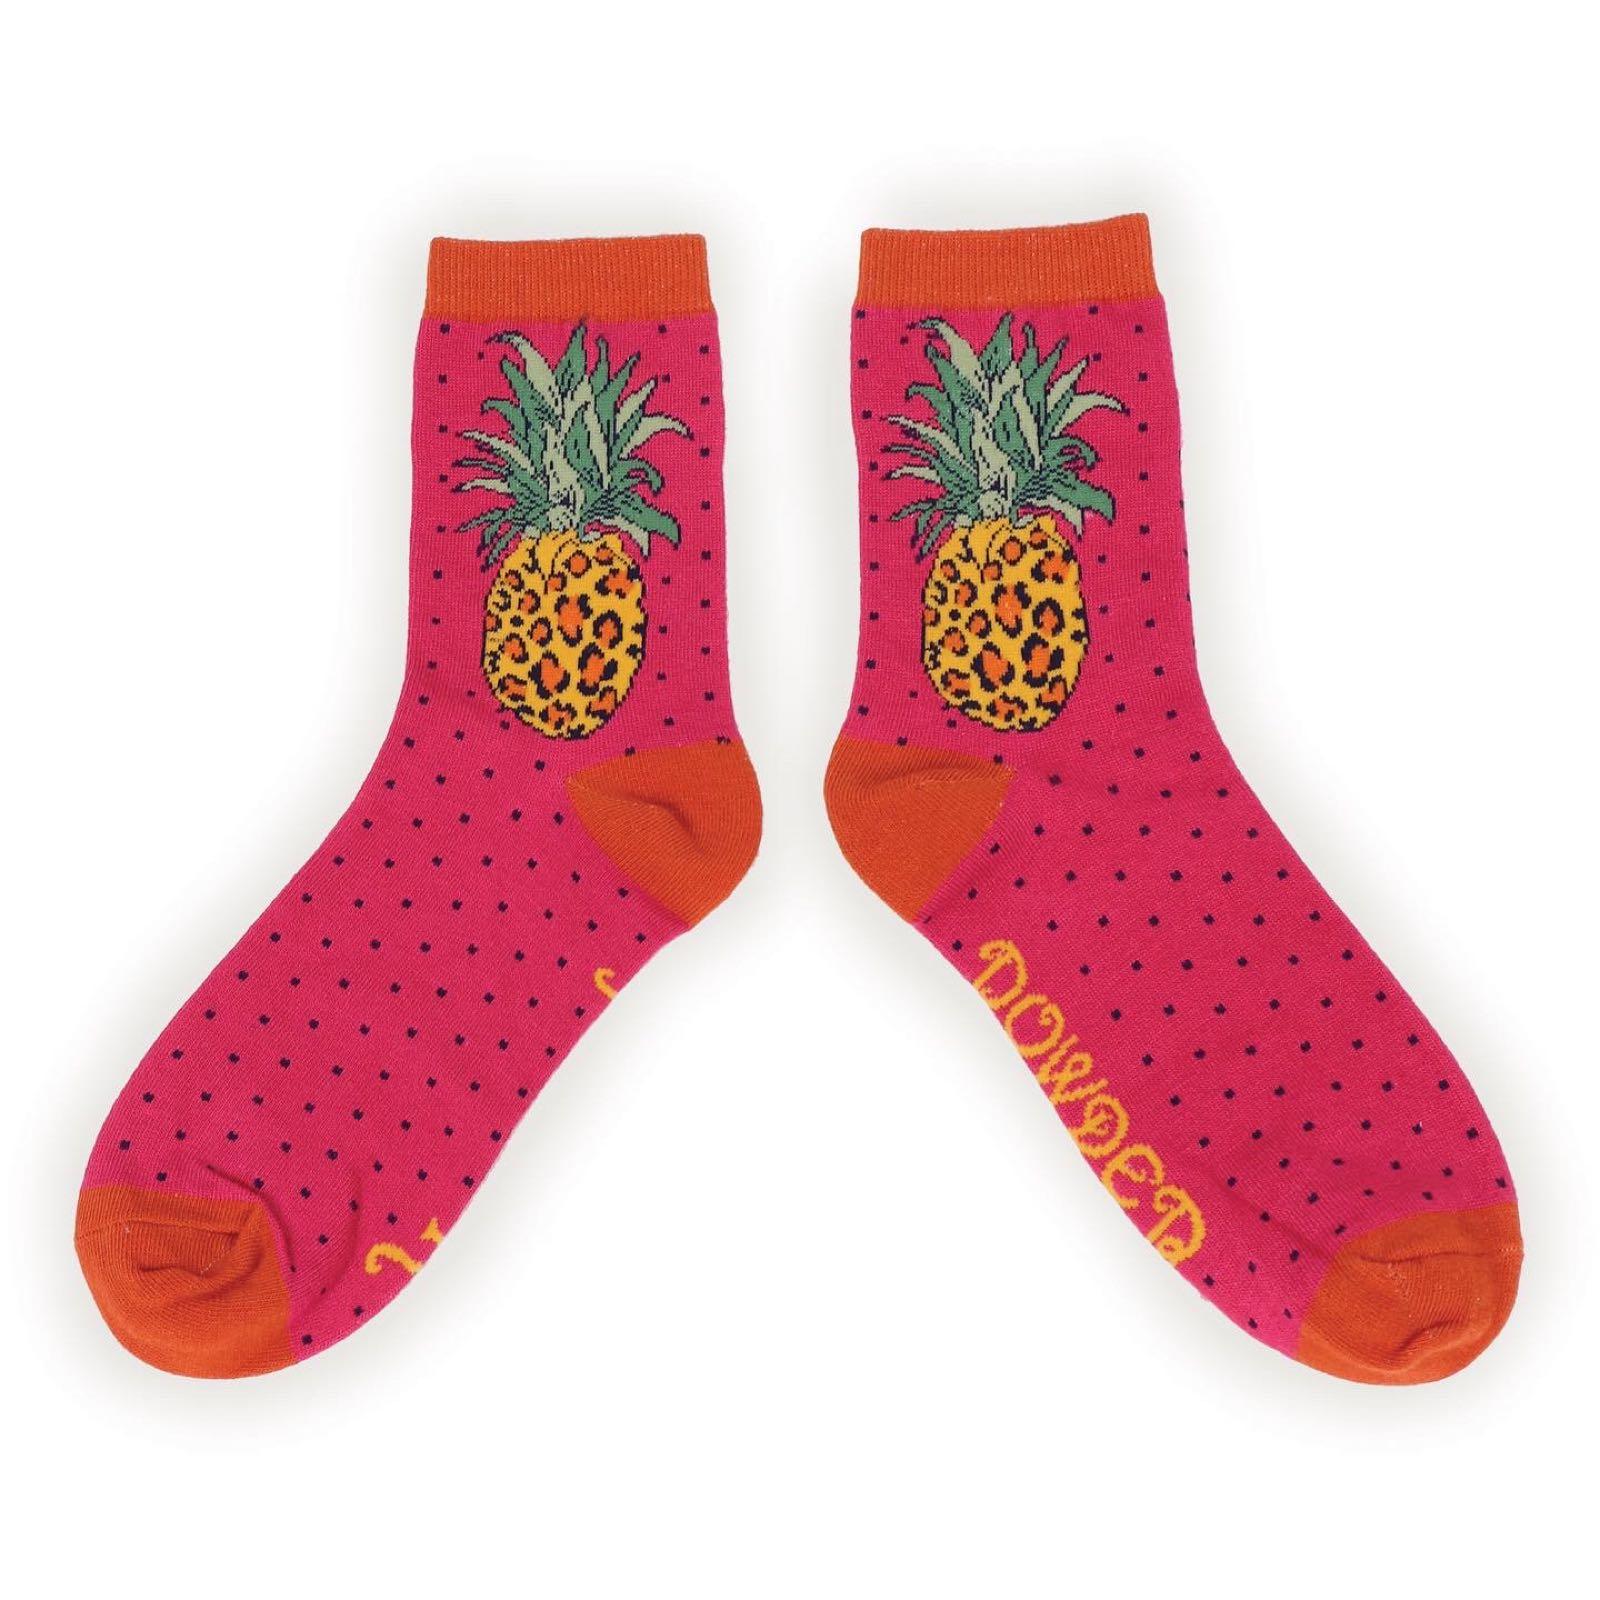 Powder Pineapple socks